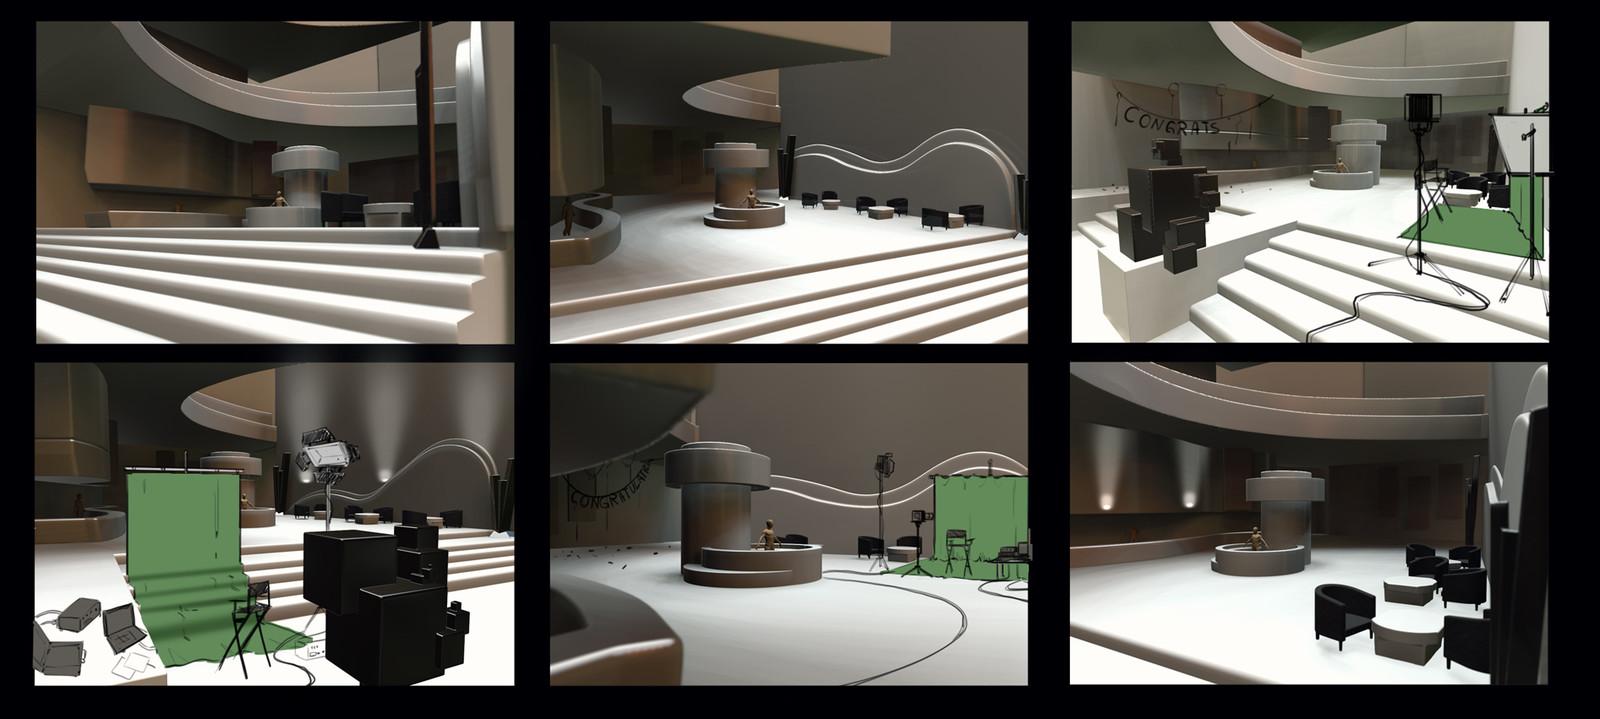 3D Concept / Camera angle test